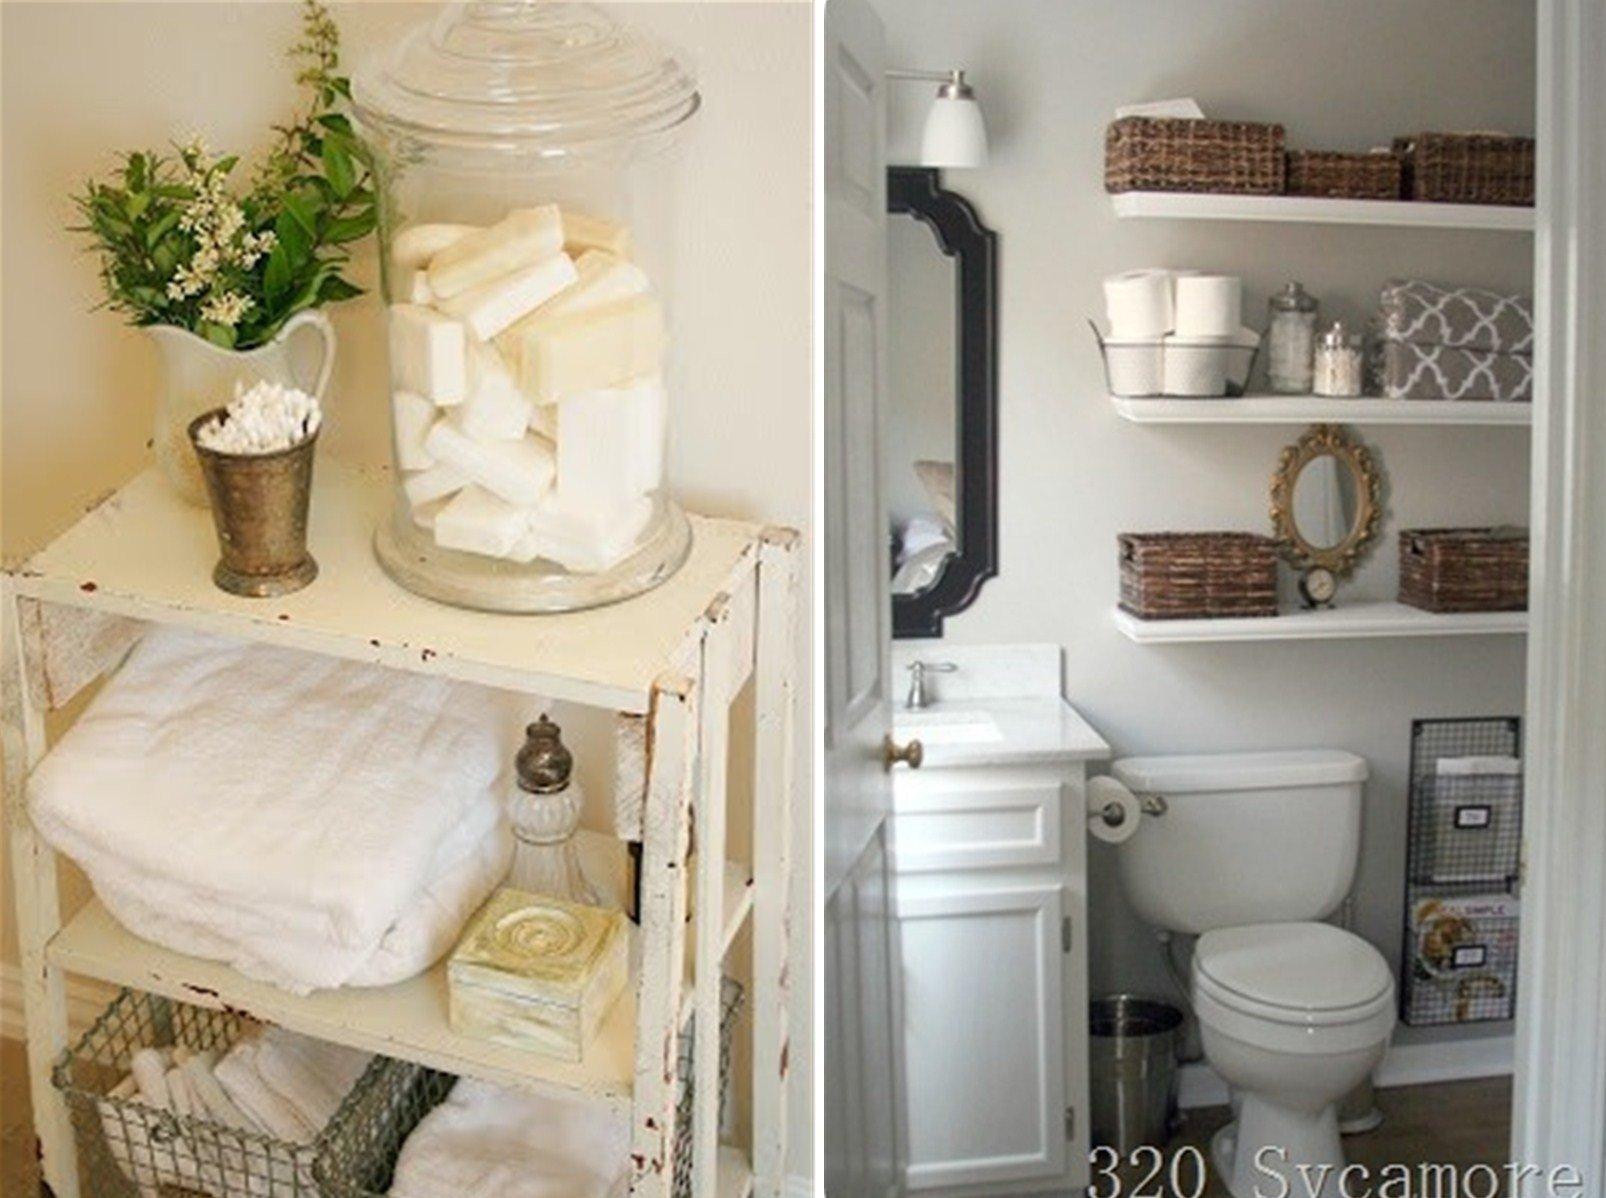 10 Famous Small Apartment Bathroom Decorating Ideas small apartment bathroom decorating ideas awesome bathroom bathroom